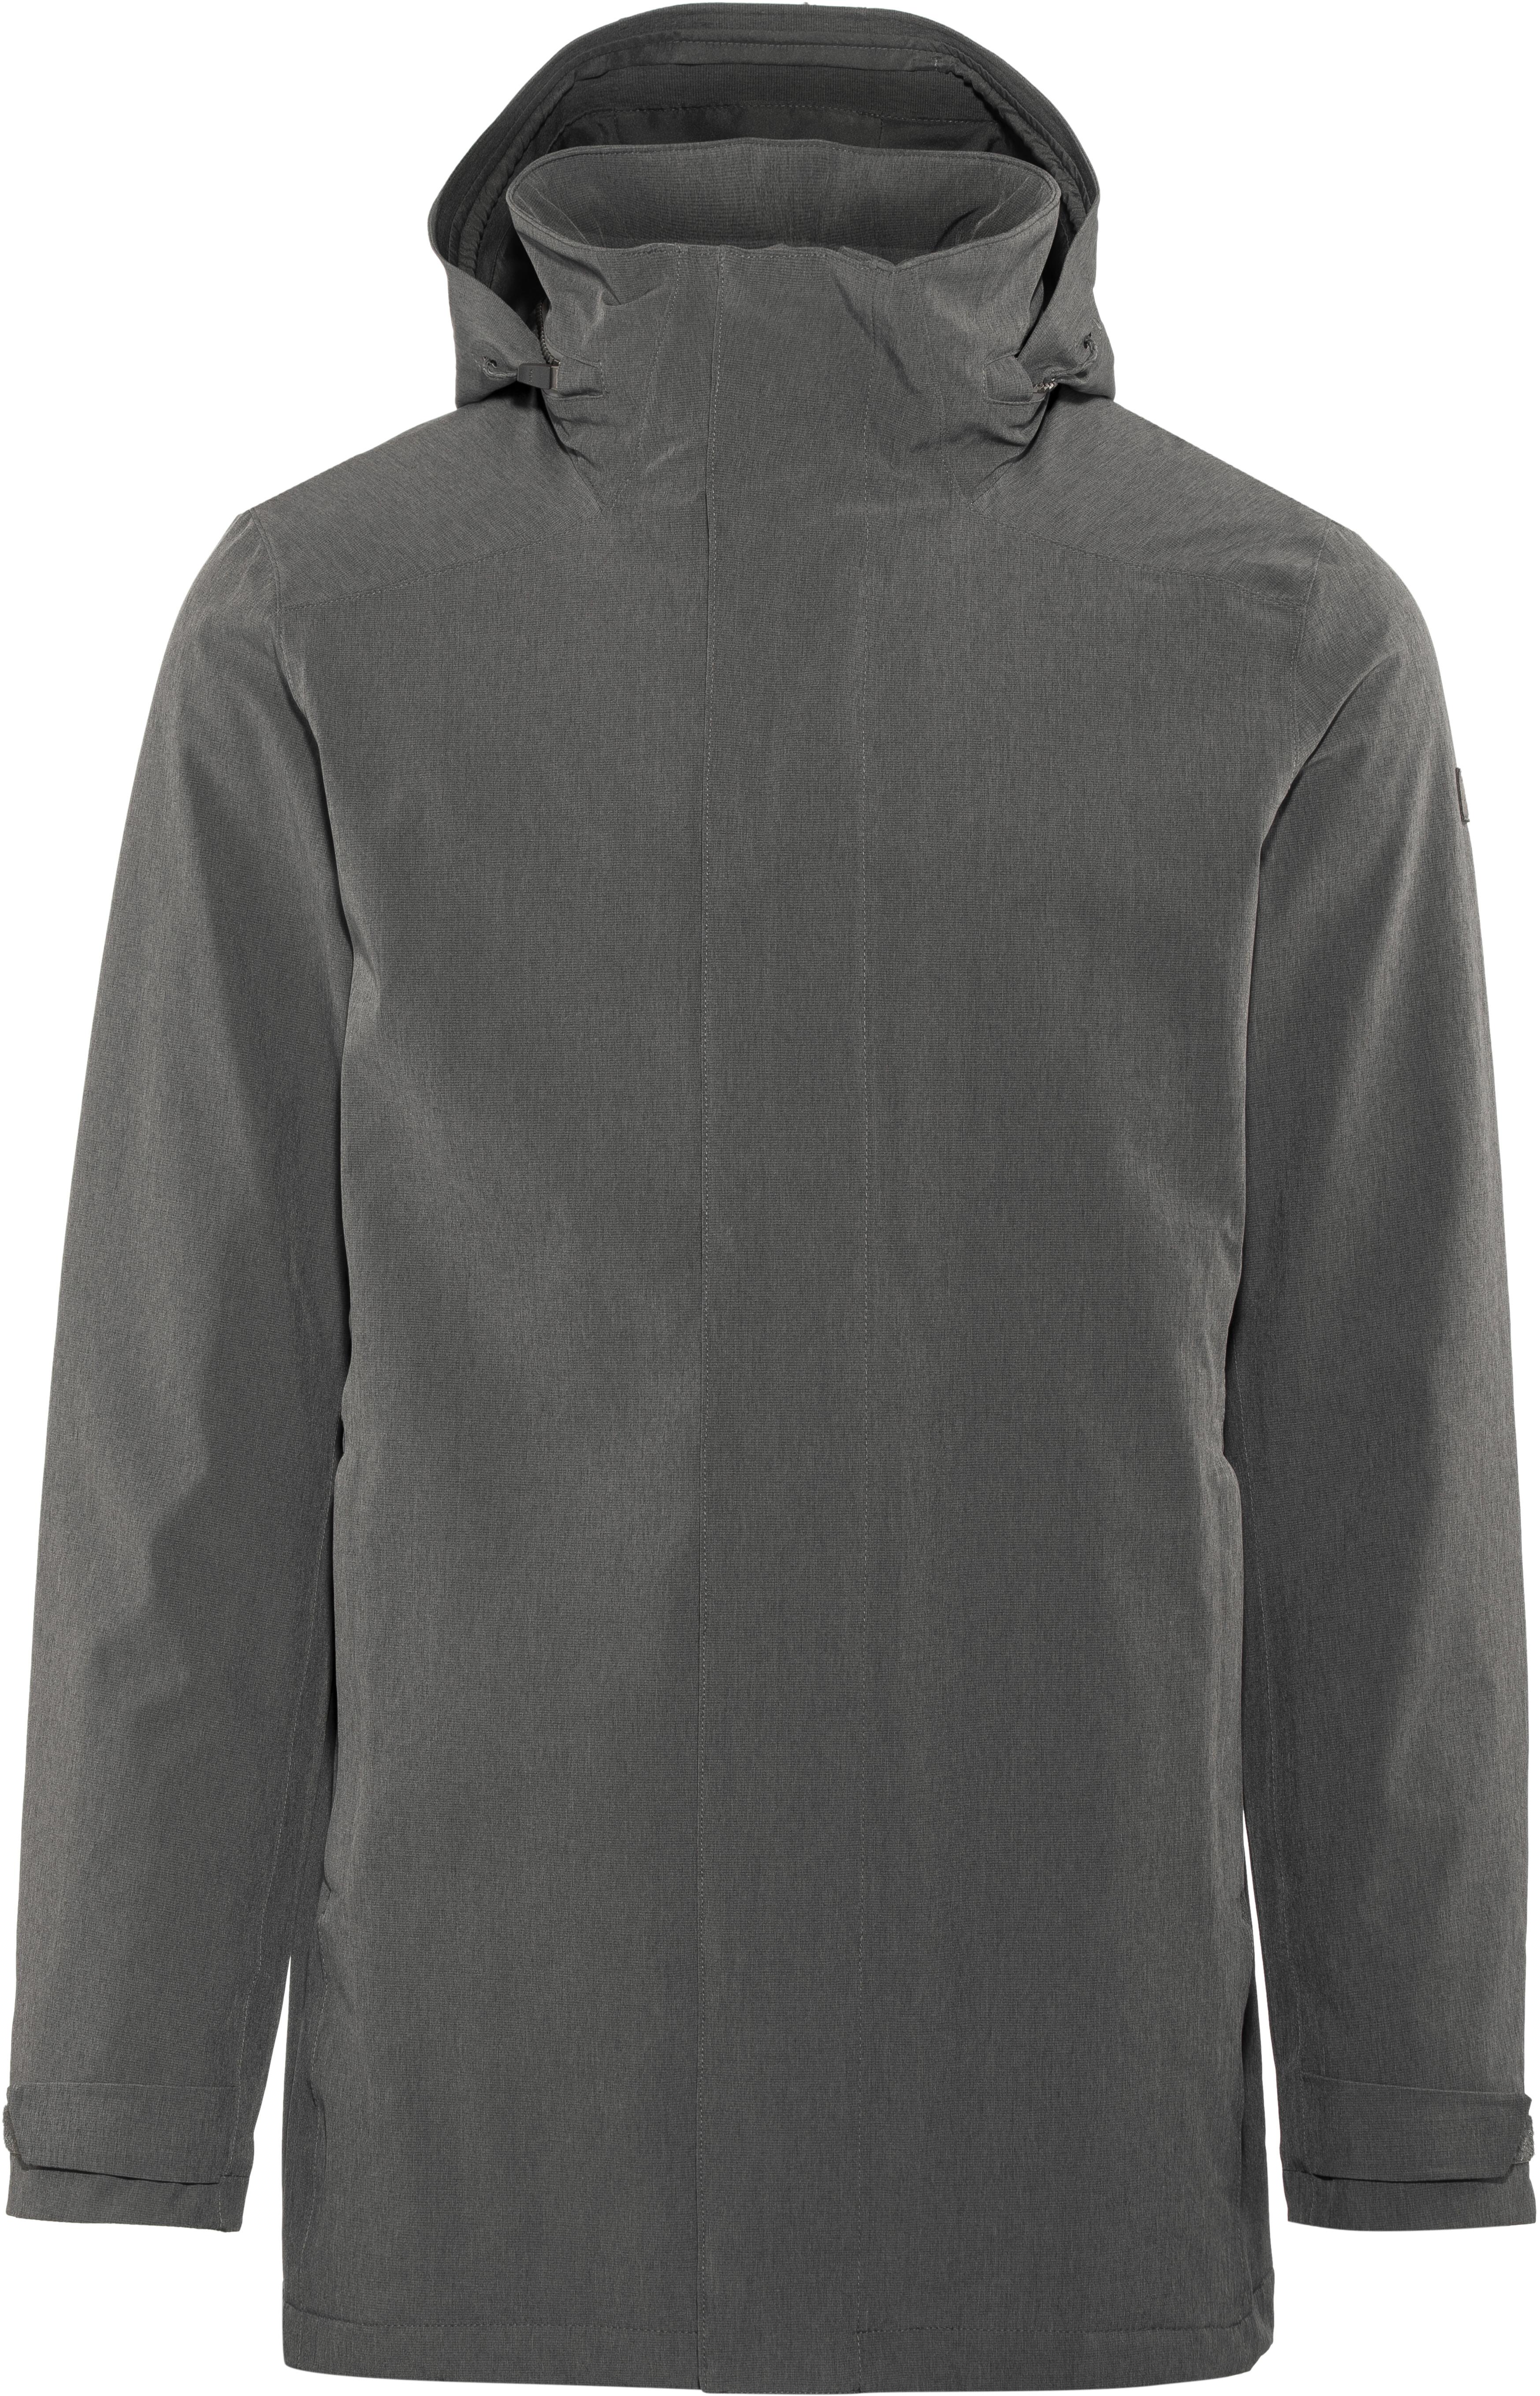 16050495195 Bergans Oslo 2L Insulated Jacket Men solidcharcoal mel at Addnature ...